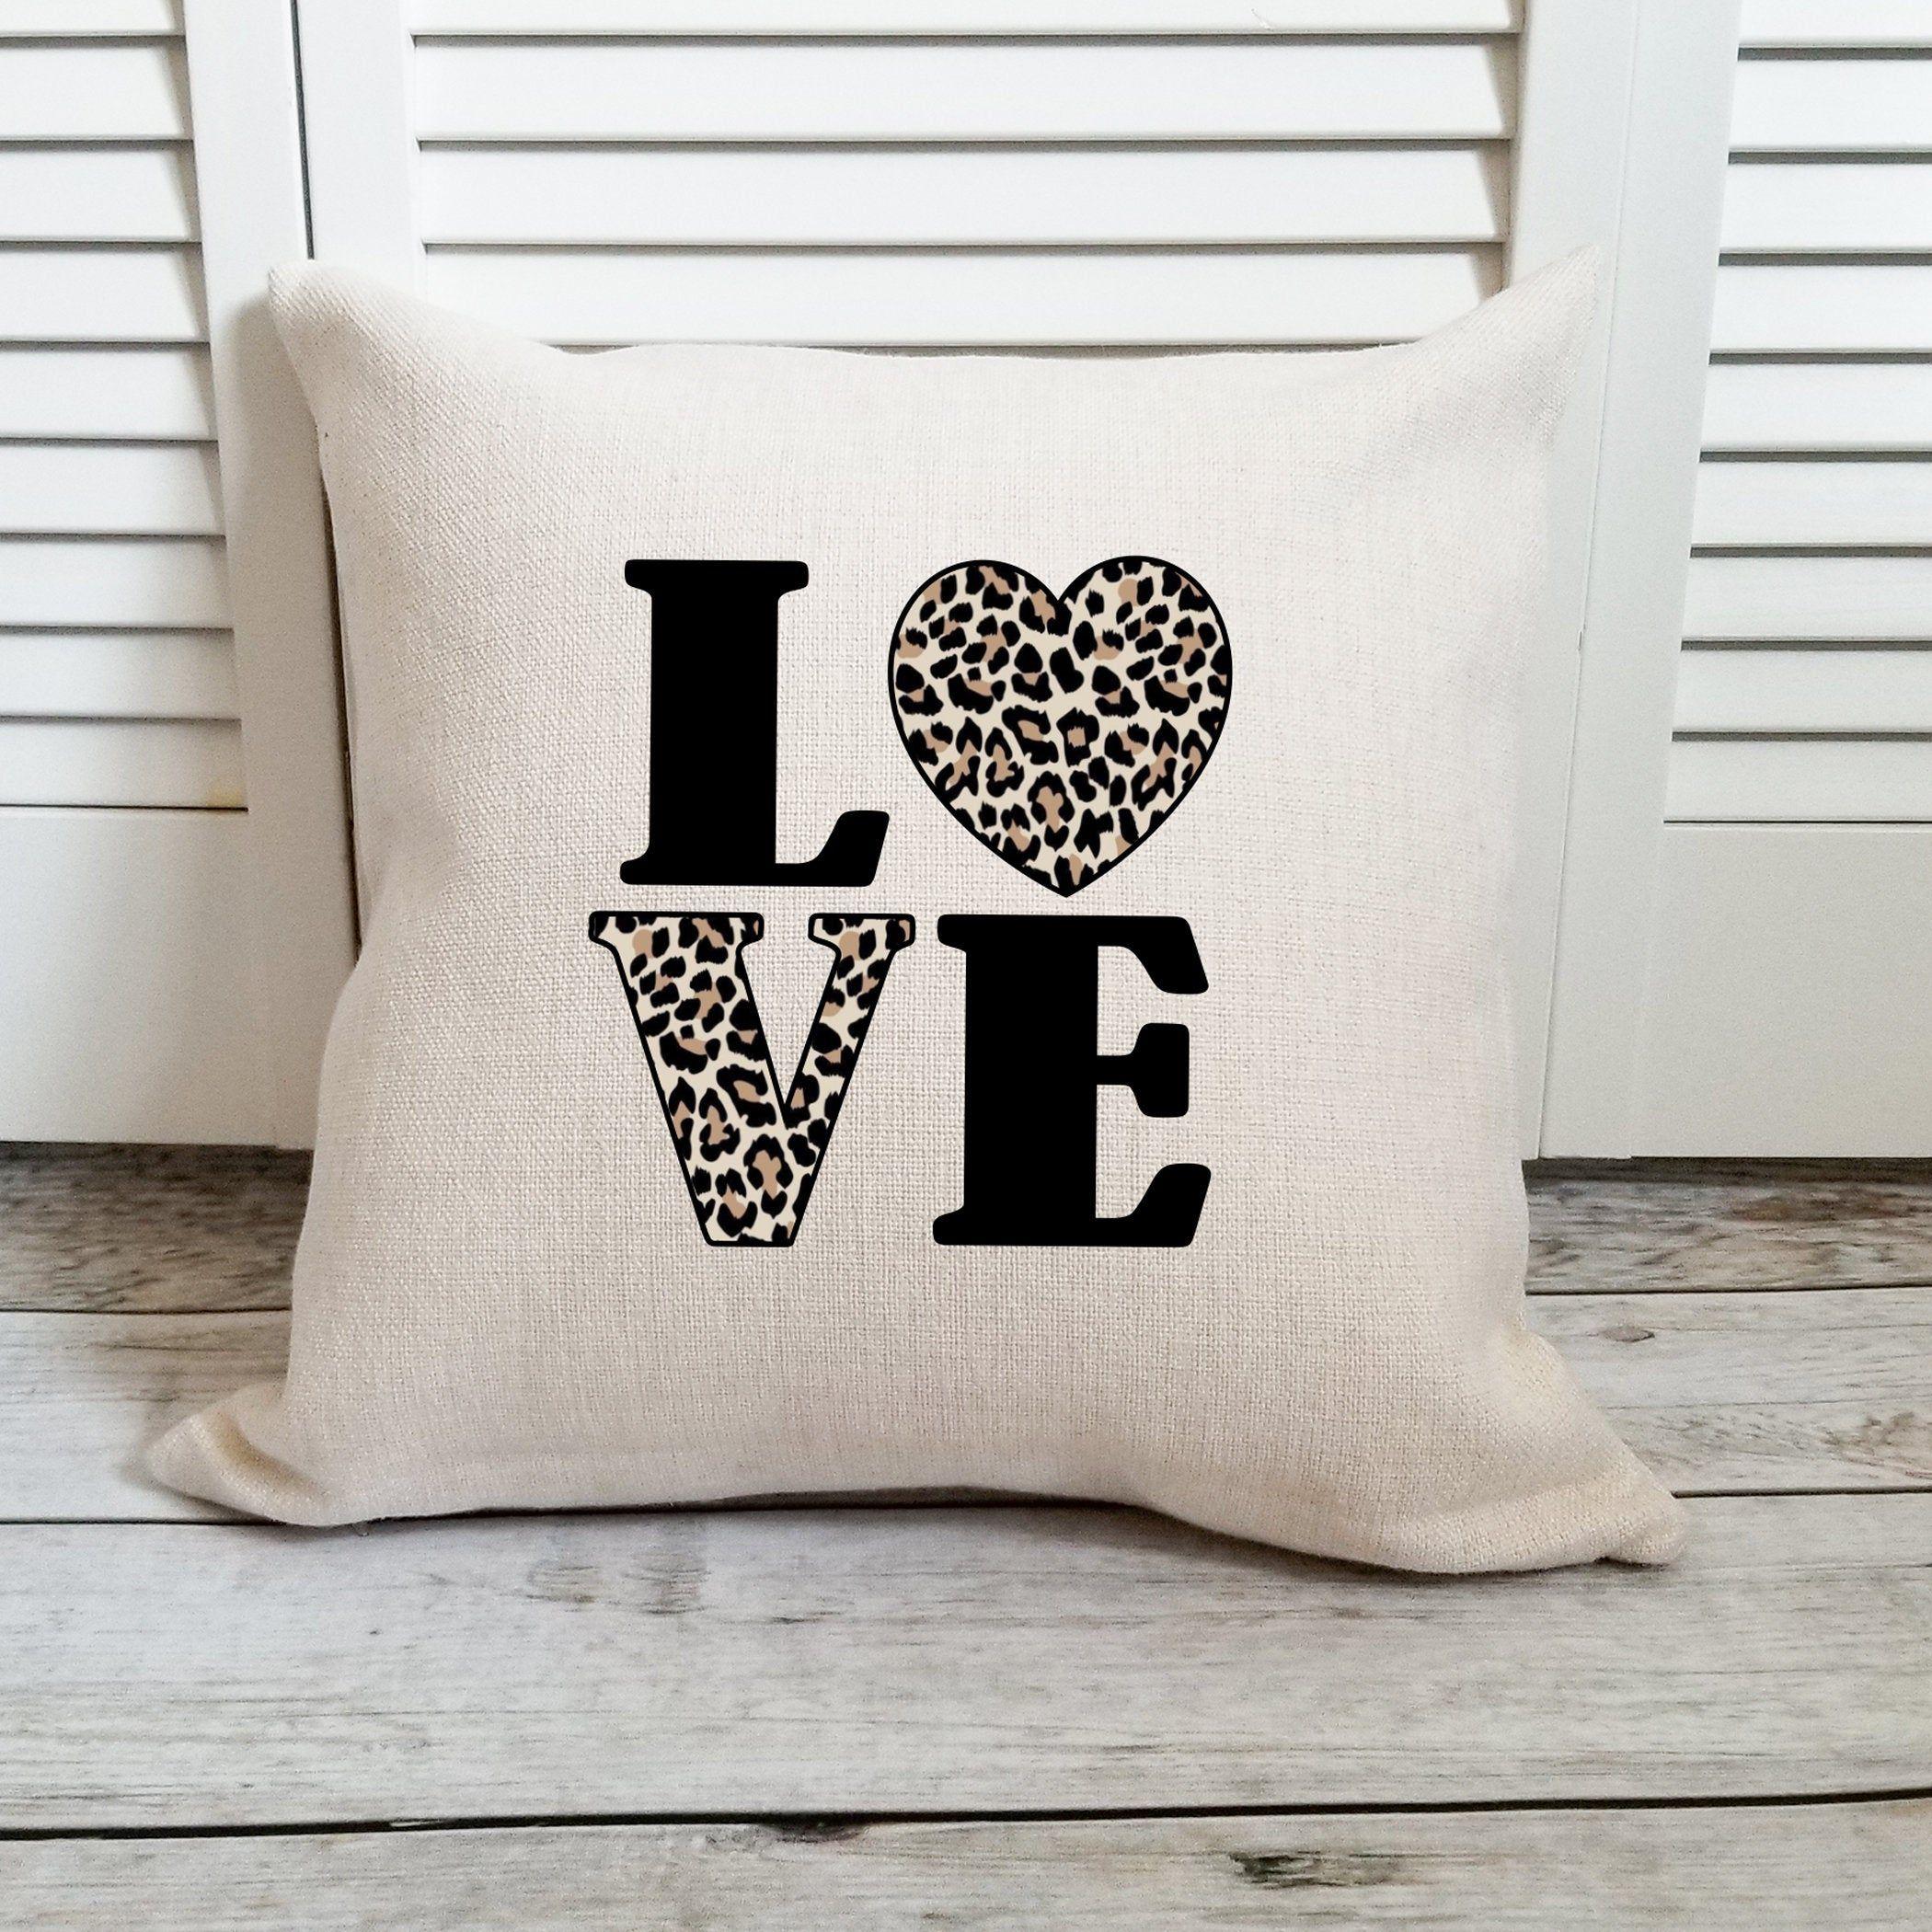 The Best Neutral Throw Pillows From Amazon Throw Pillows Living Room Living Room Pillows Neutral Throw Pillows